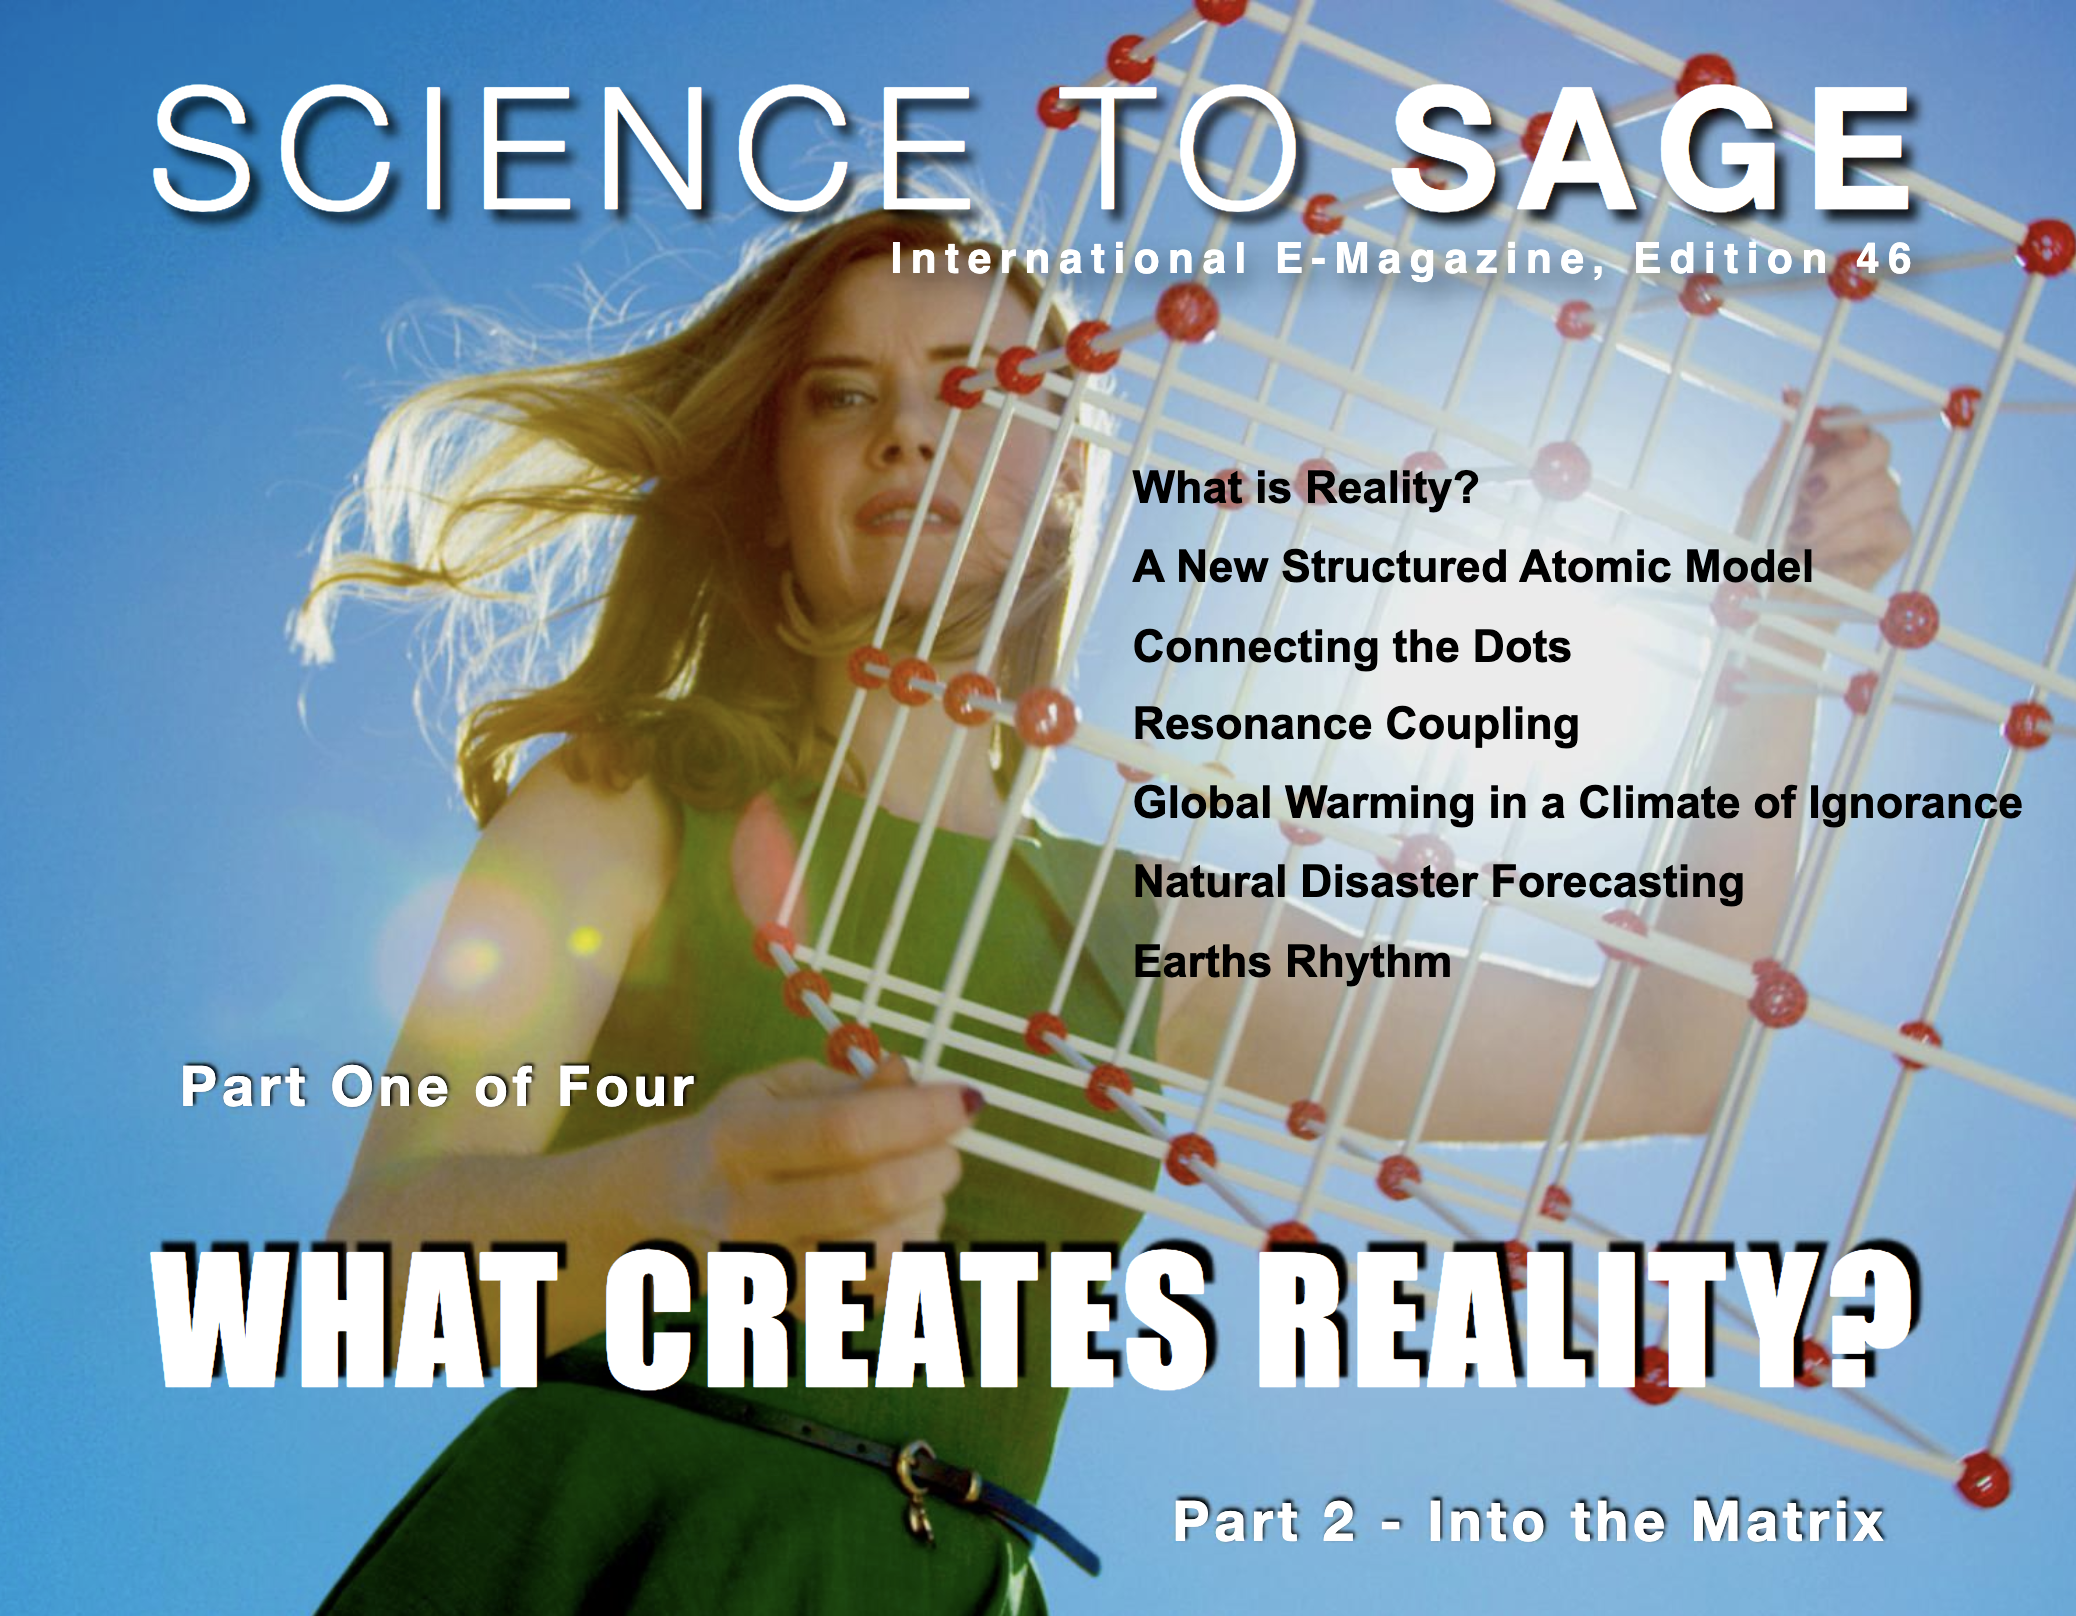 46-WHAT CREATES REALITY?